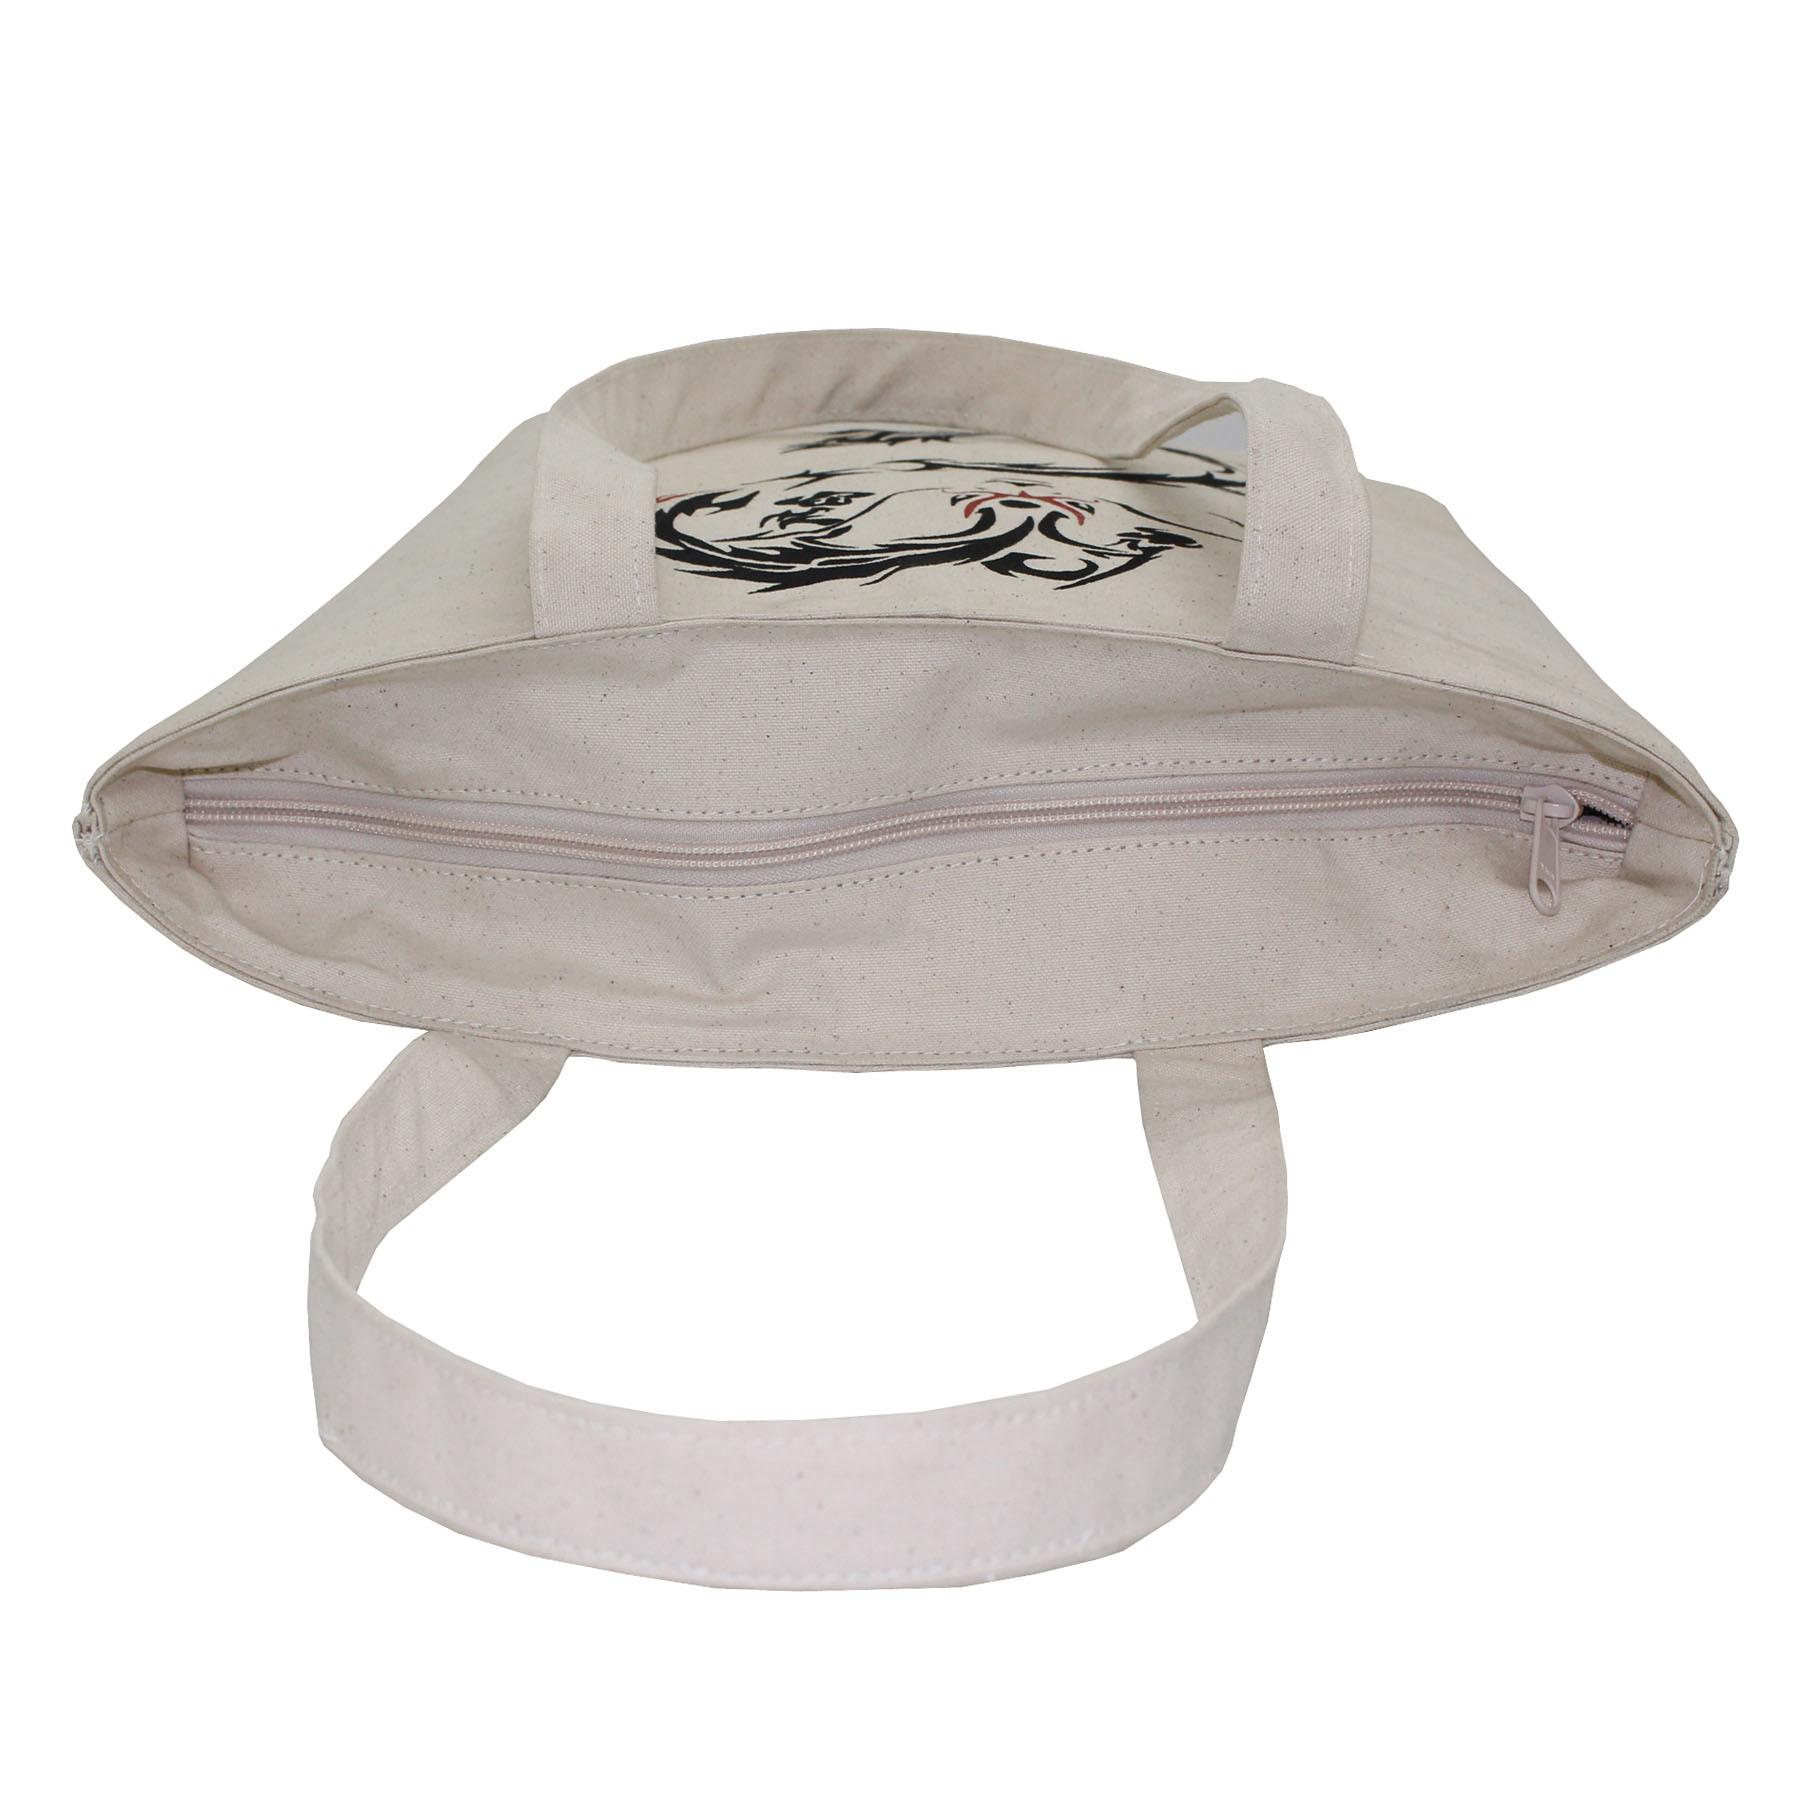 12 Oz Natural Canvas Cooler Bag With Inside Insulator